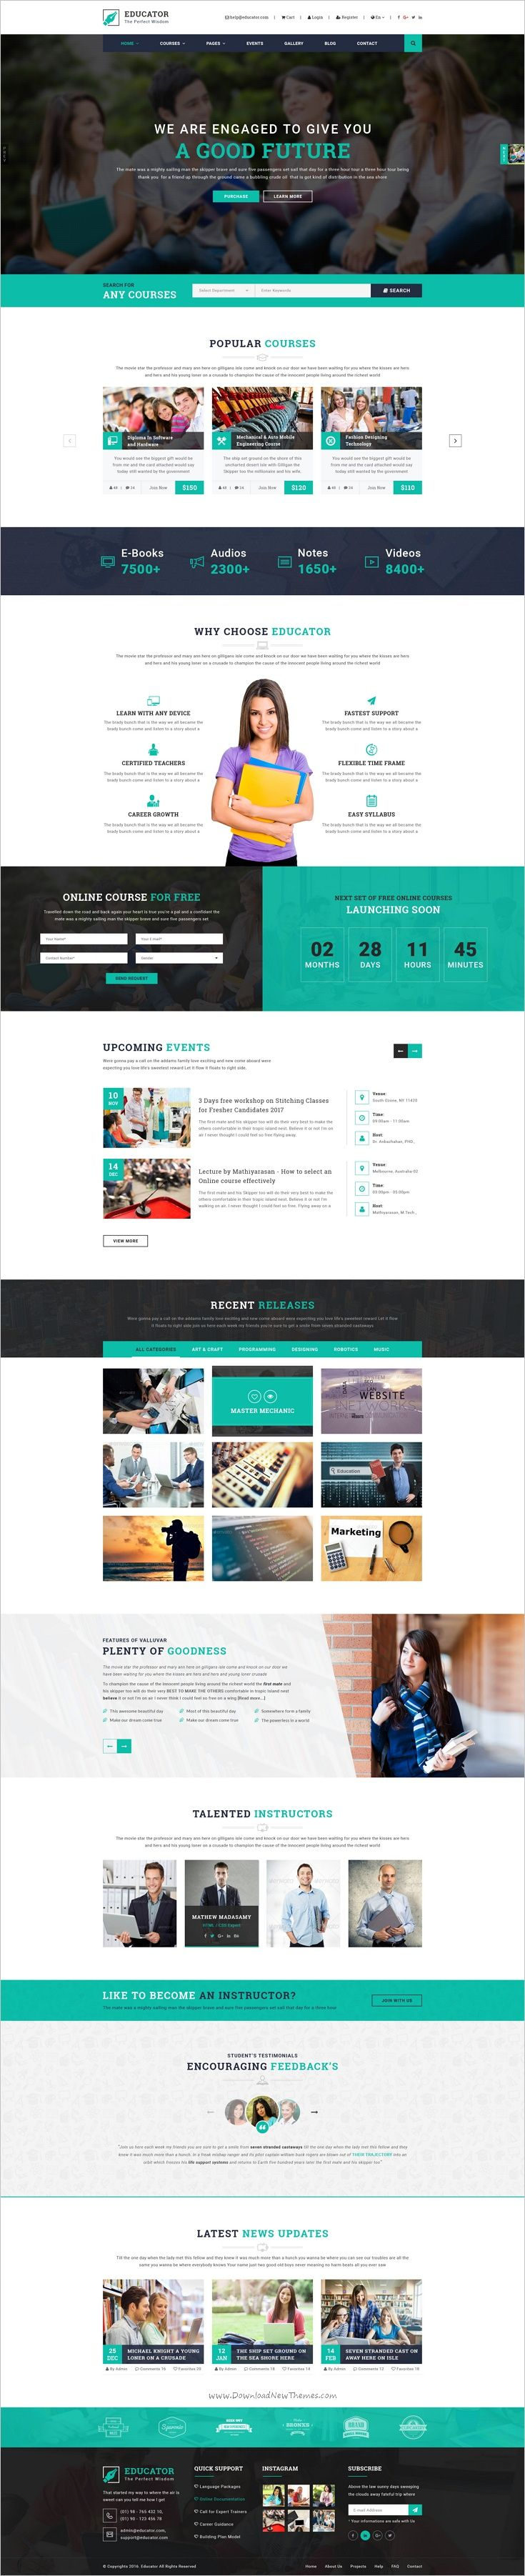 94 best education website images on Pinterest | College school ...